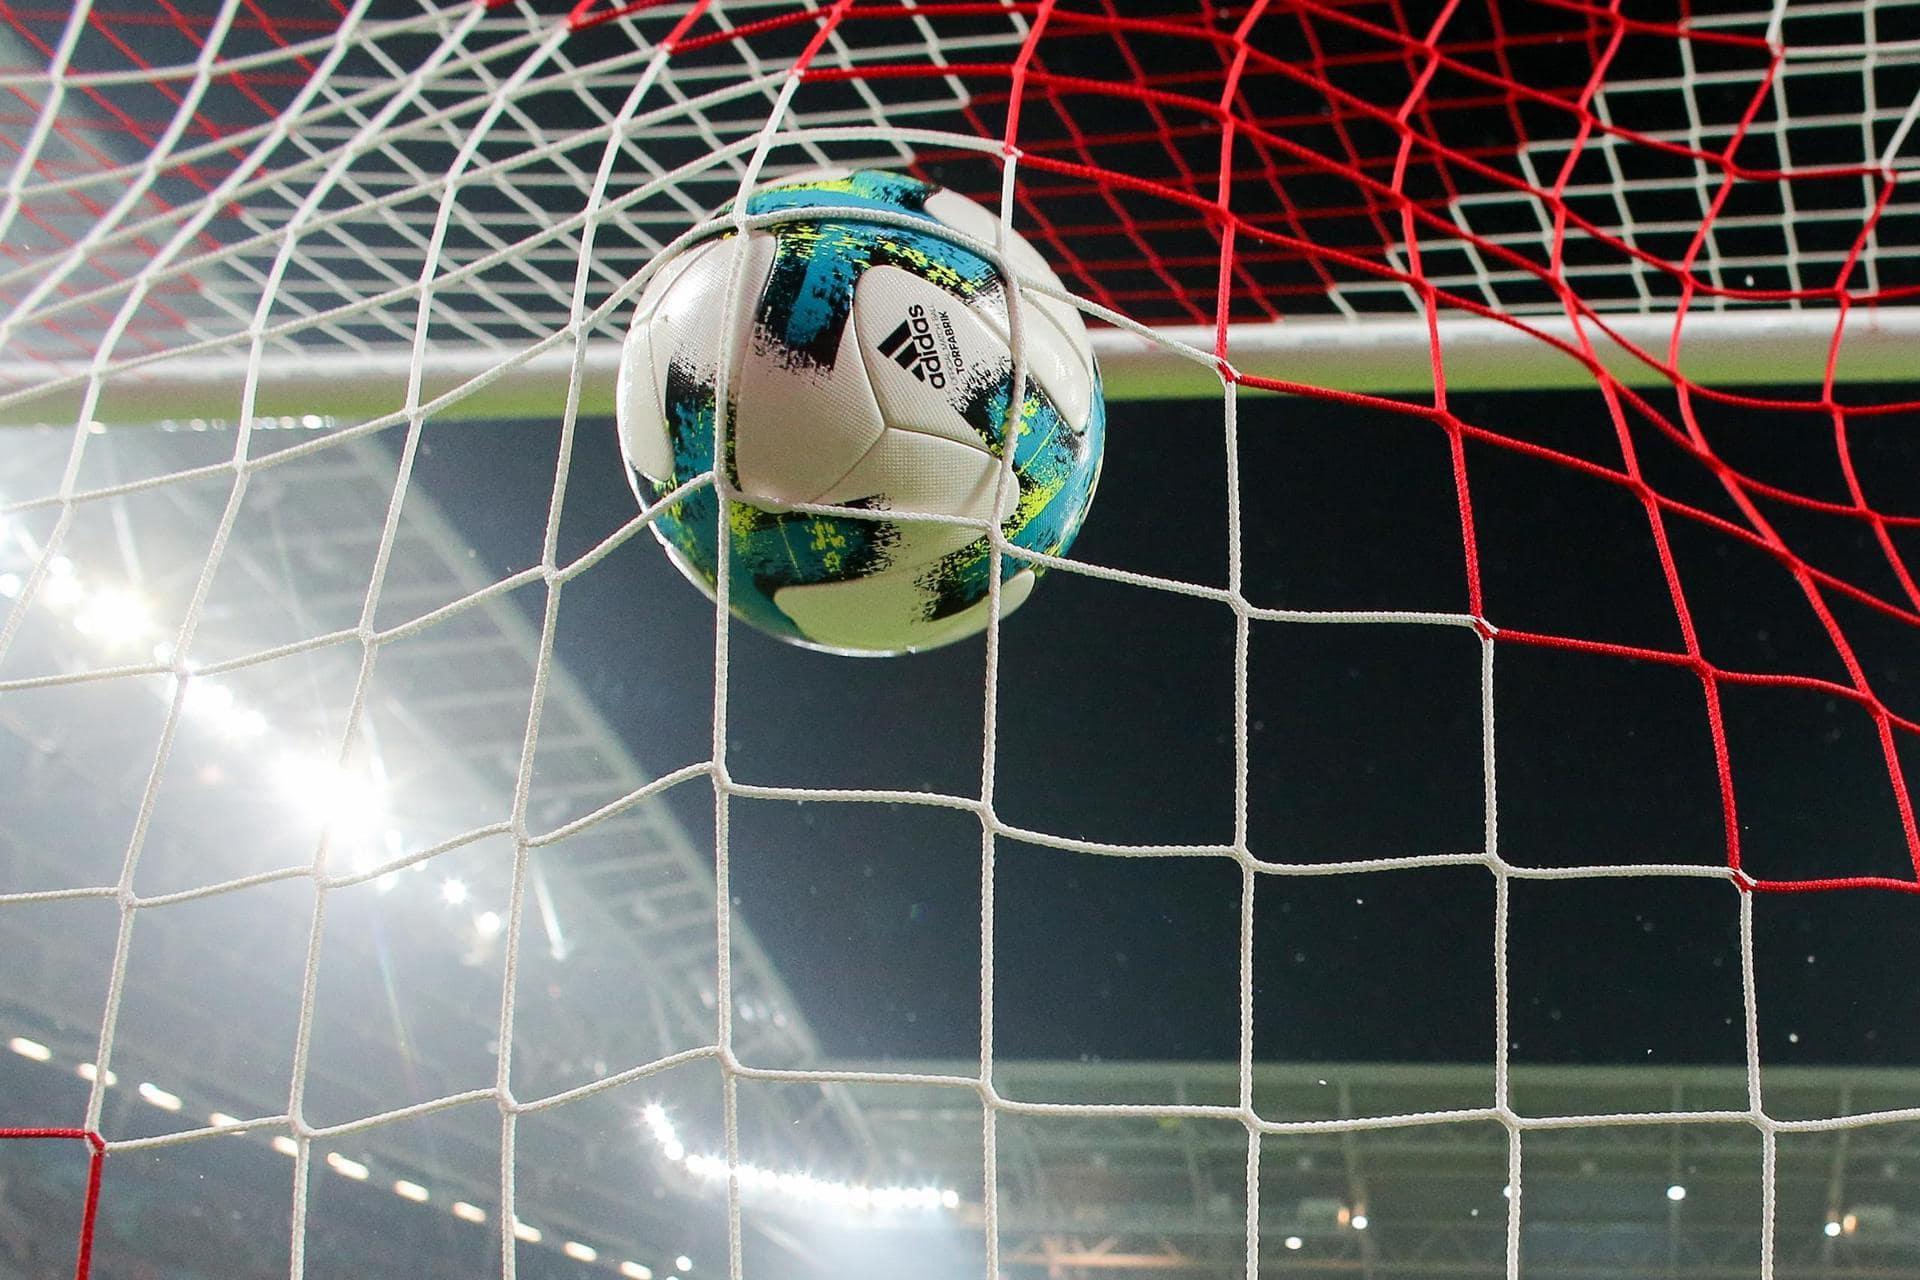 Regensburg eröffnet Pokal-Viertelfinale gegen Werder Bremen DFB-Pokal